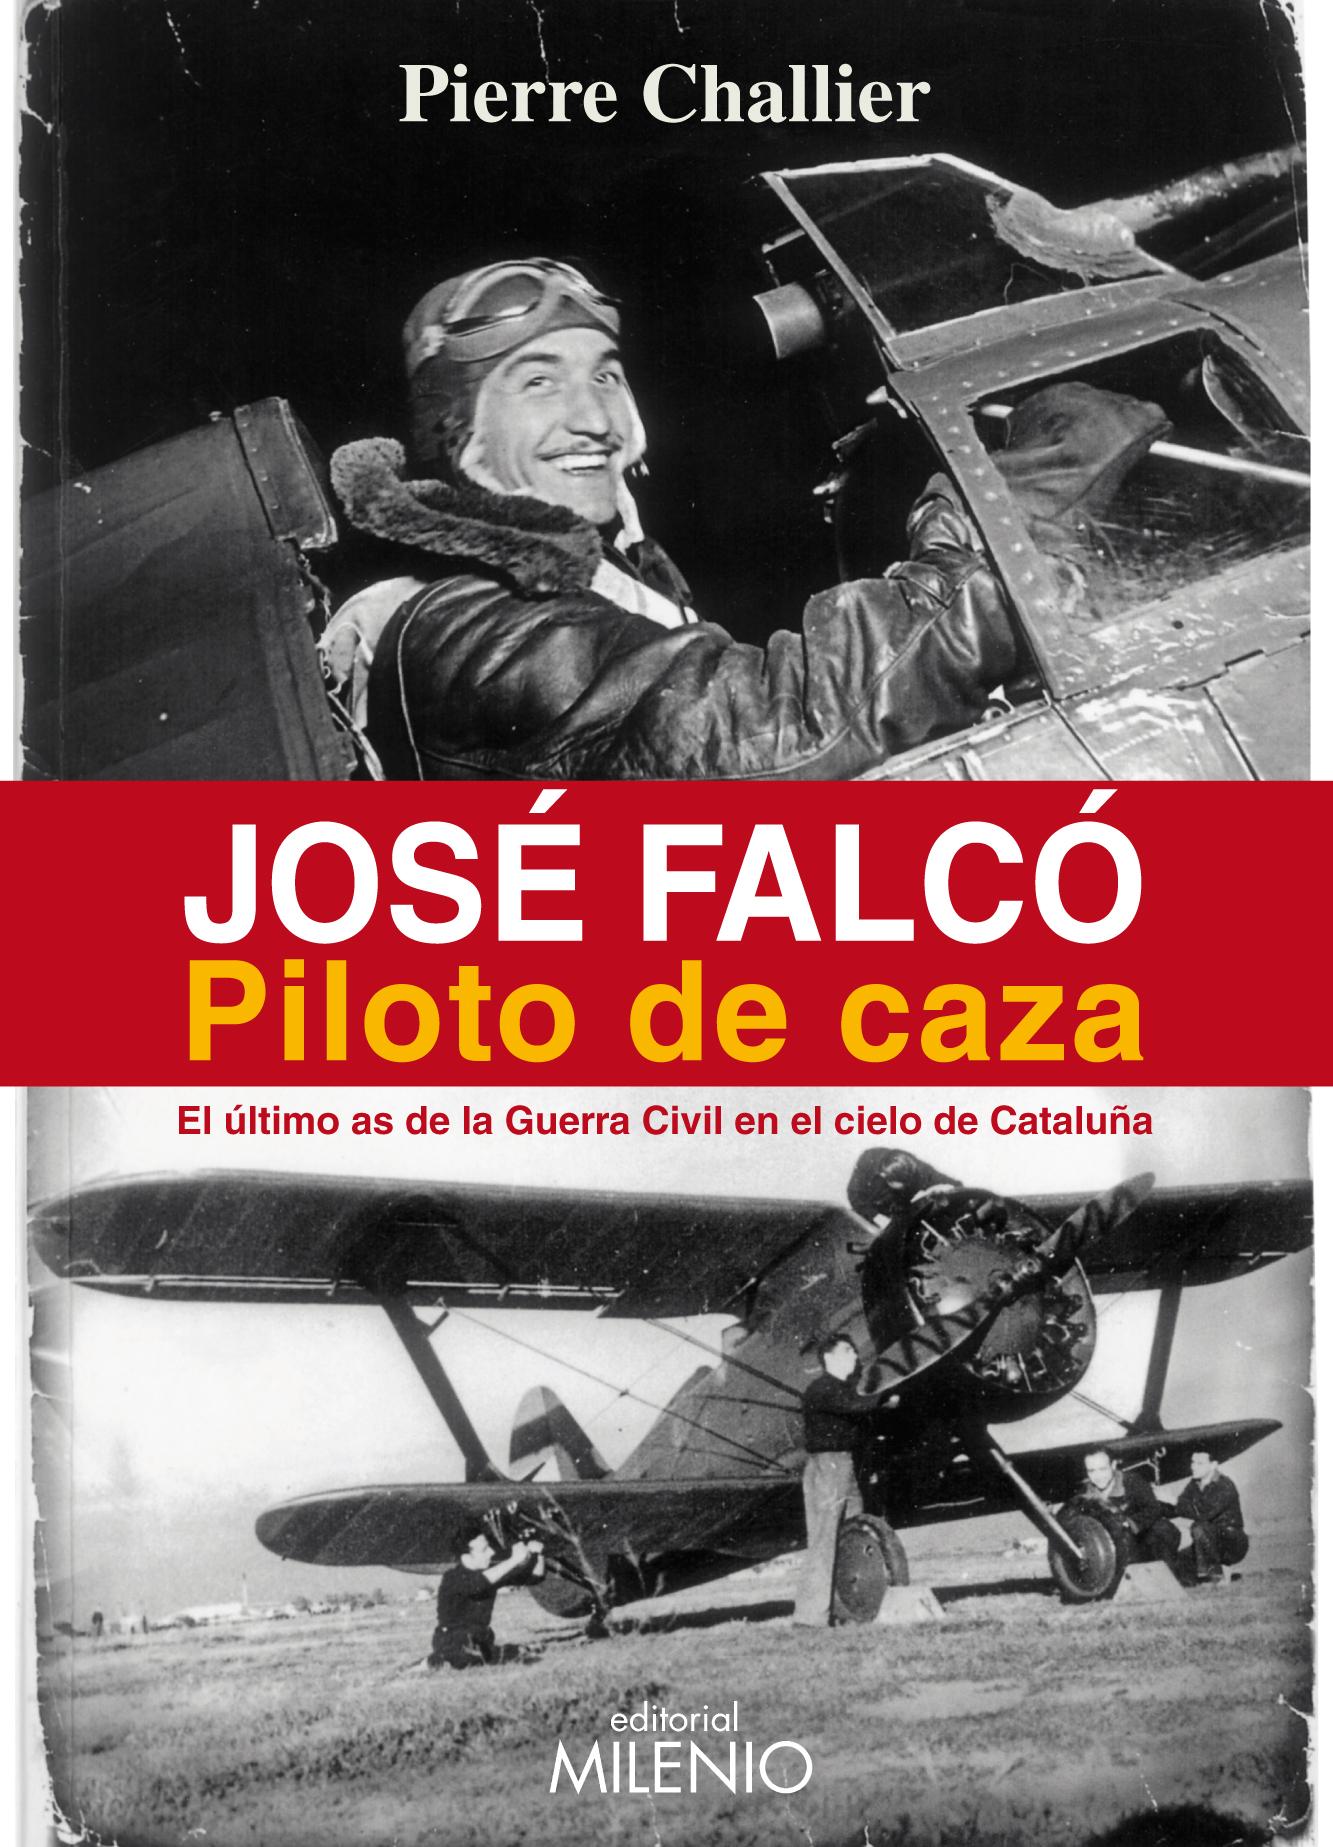 1310-jose-falco-piloto-de-caza.jpg